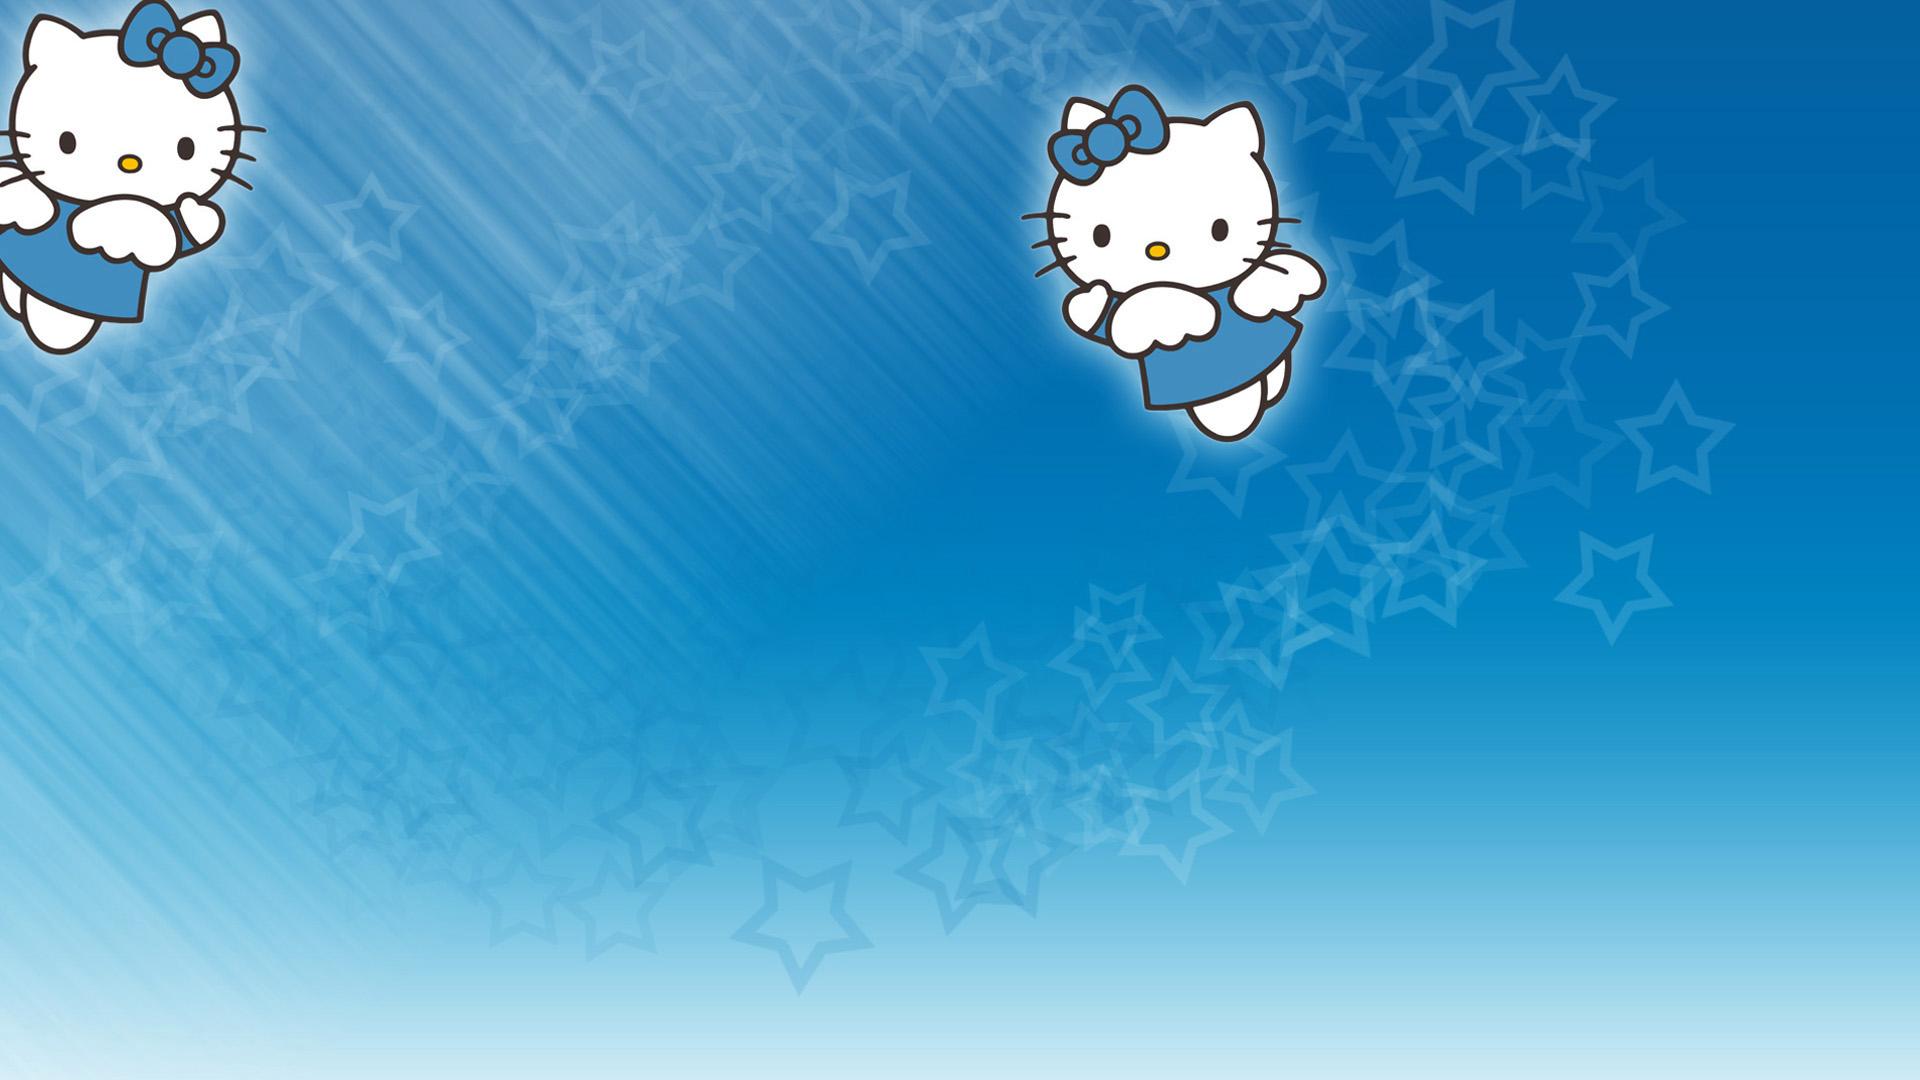 hello kitty高清桌面壁纸高清壁纸 宽屏壁纸 个性桌面壁纸 高清图片